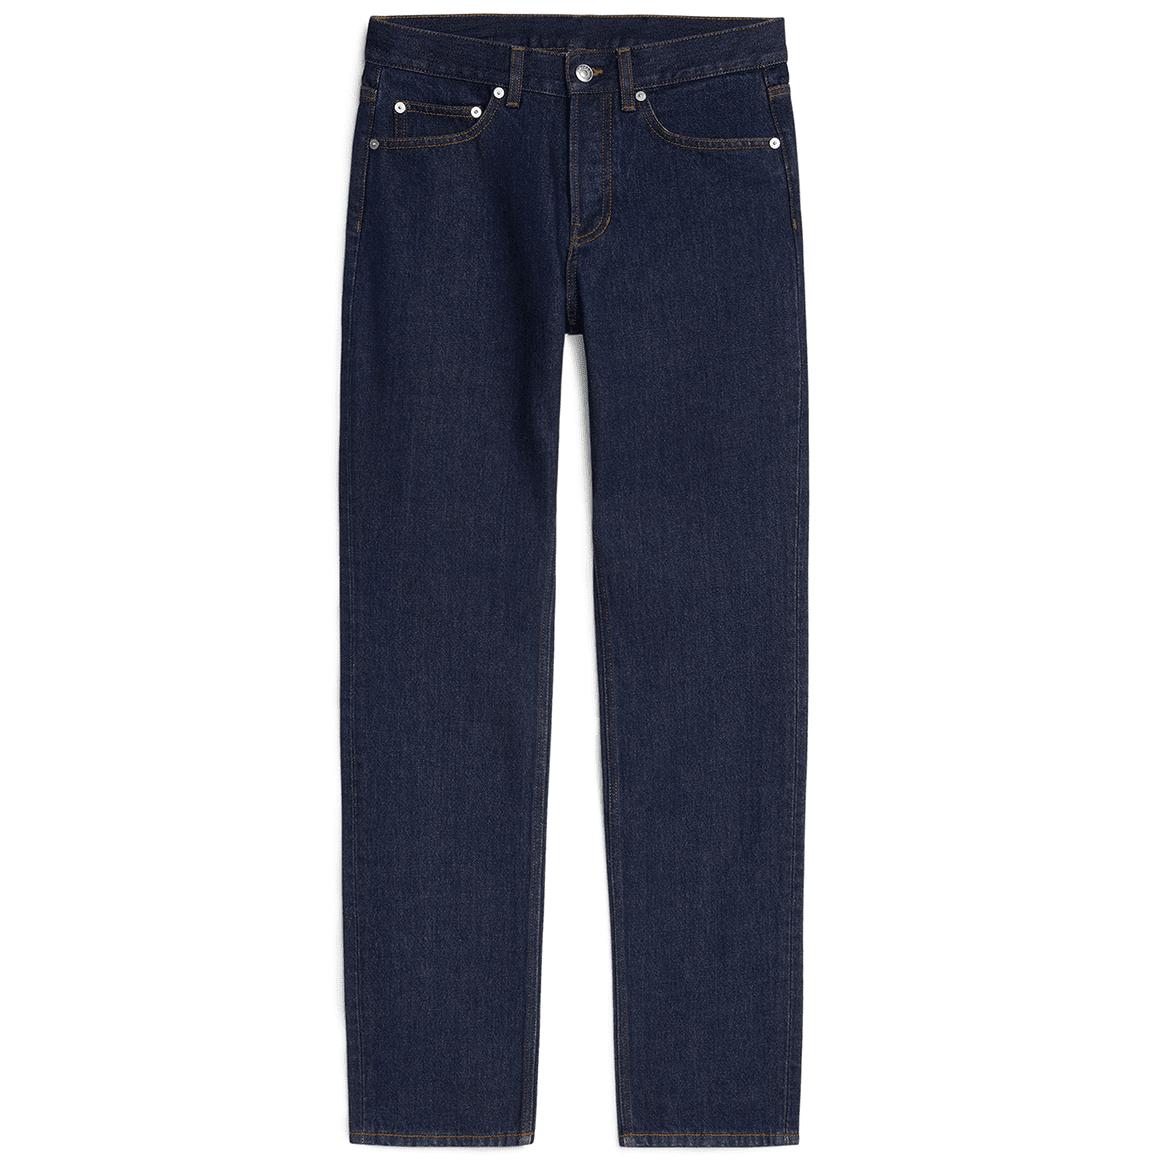 ARKET Regular Rinsed Indigo Jeans